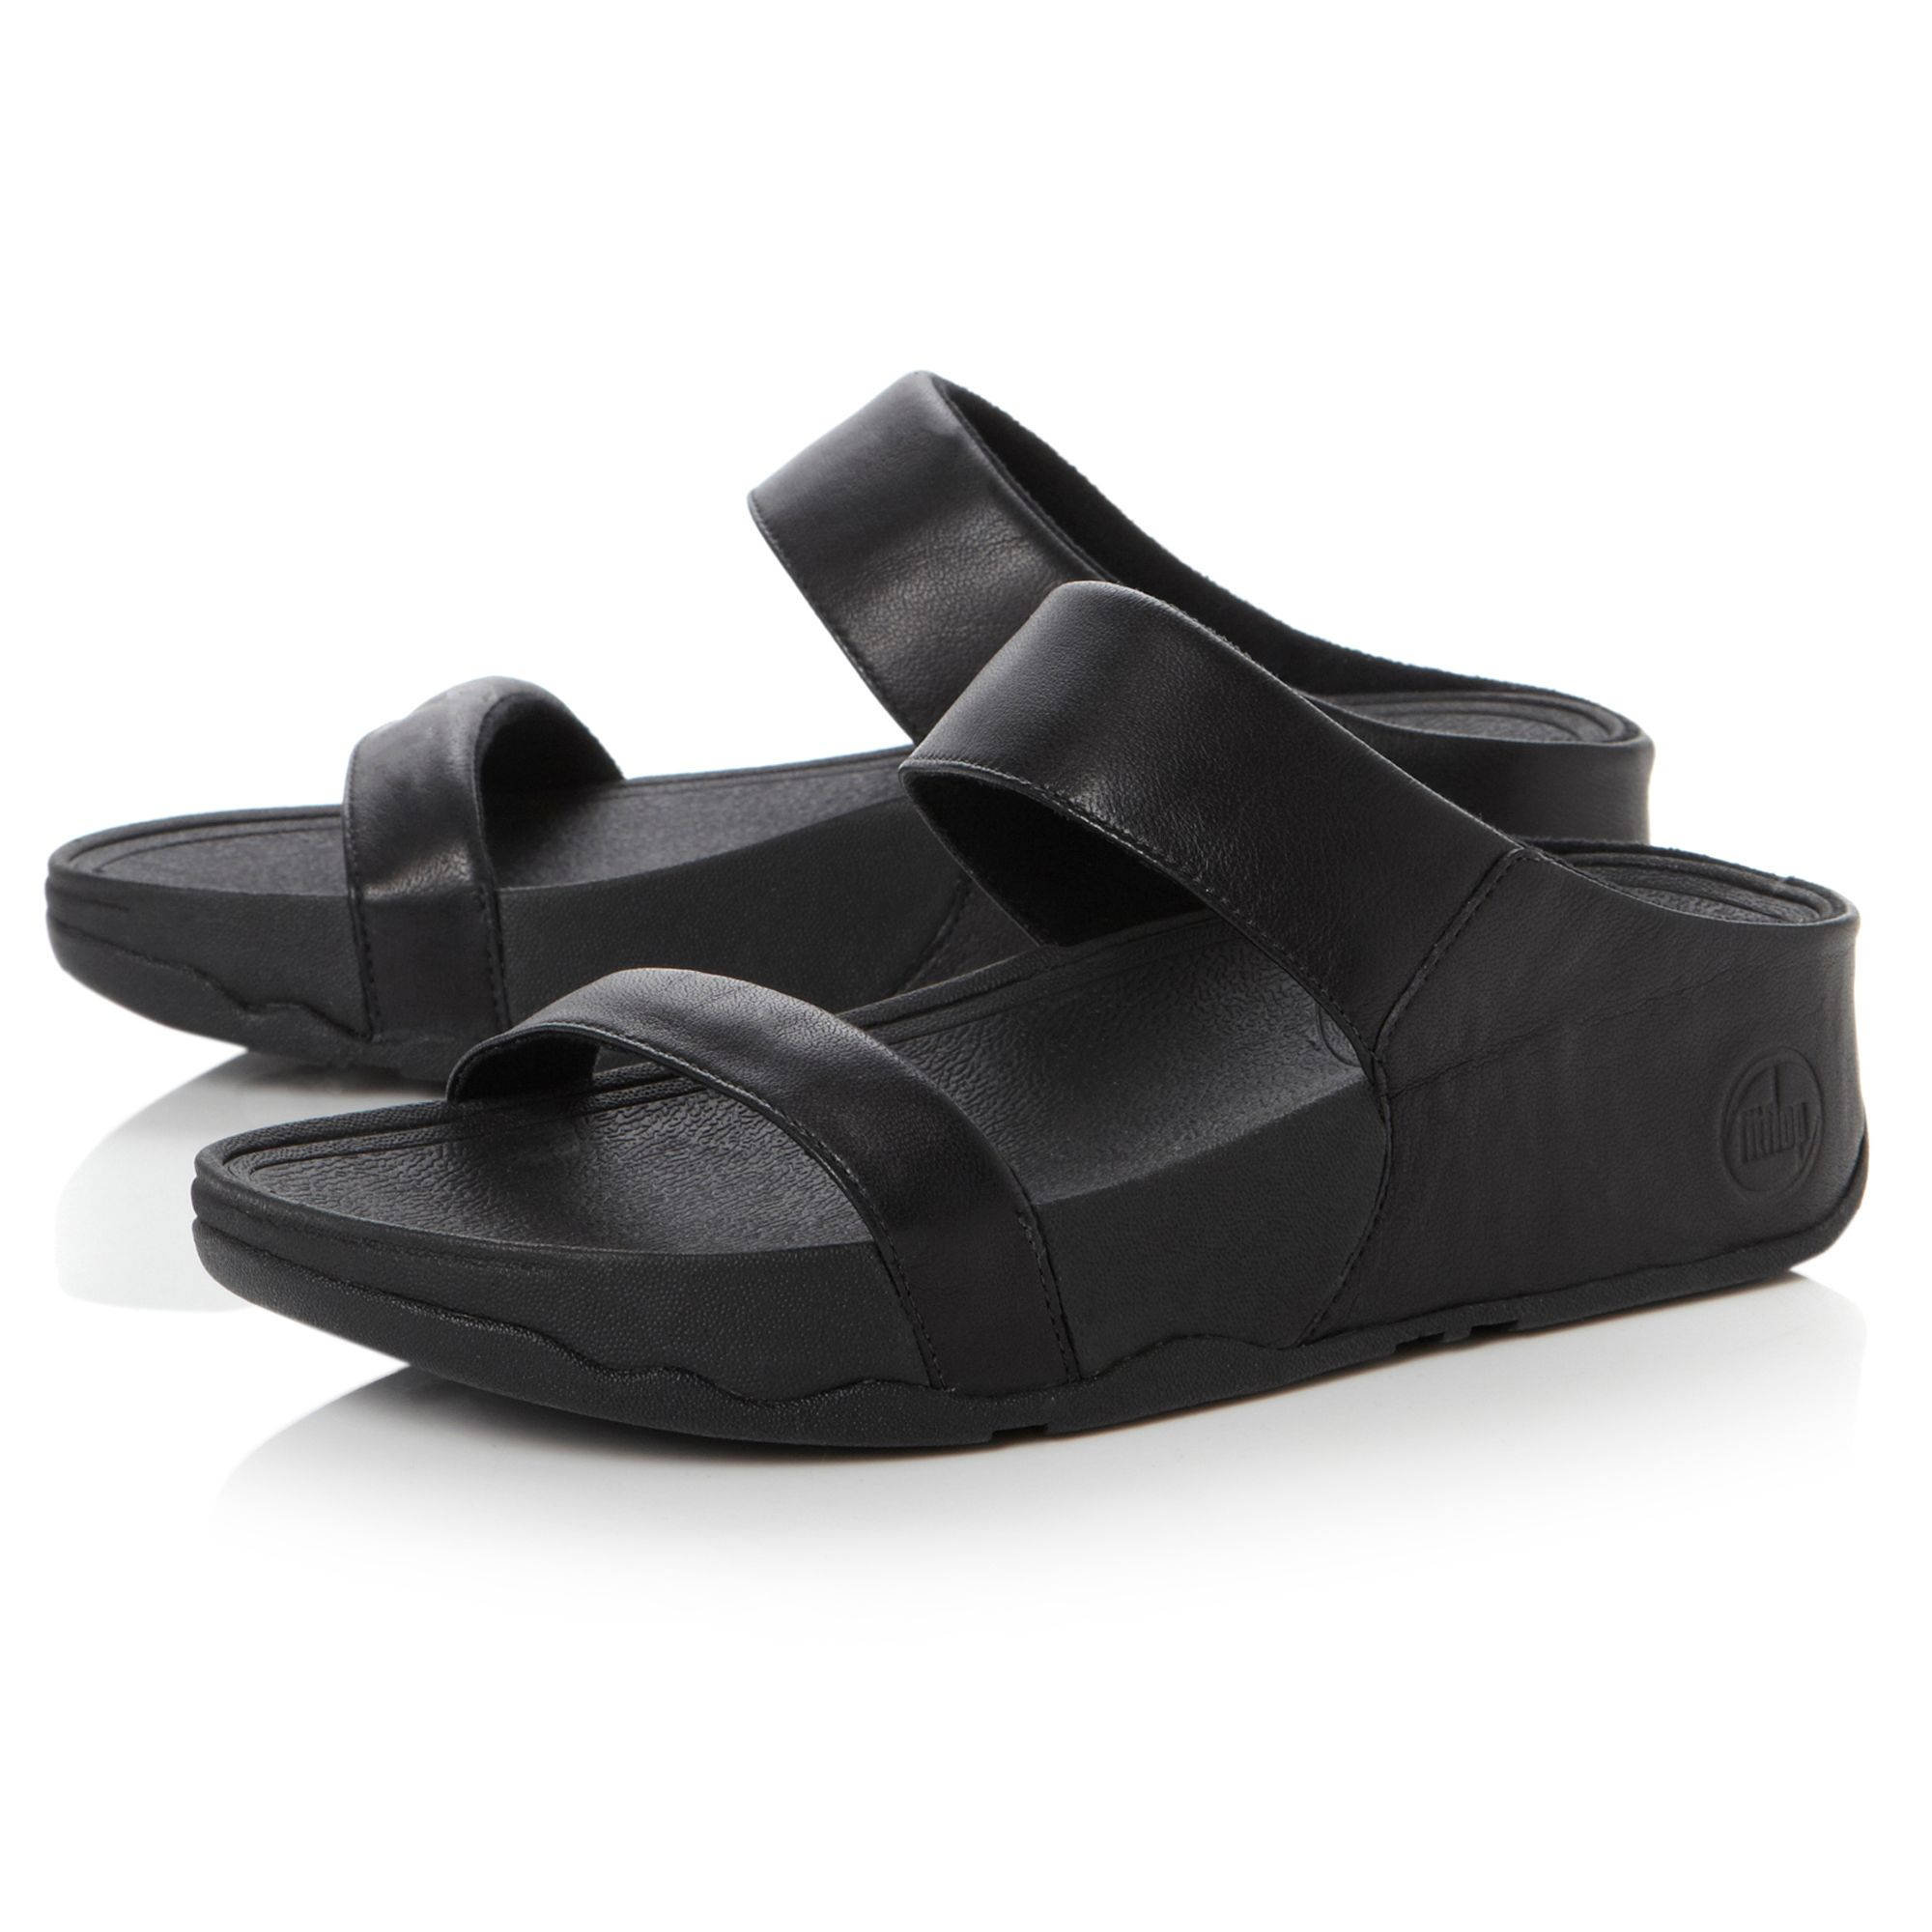 860434307c2f3 Fitflop Lulu Slide Black